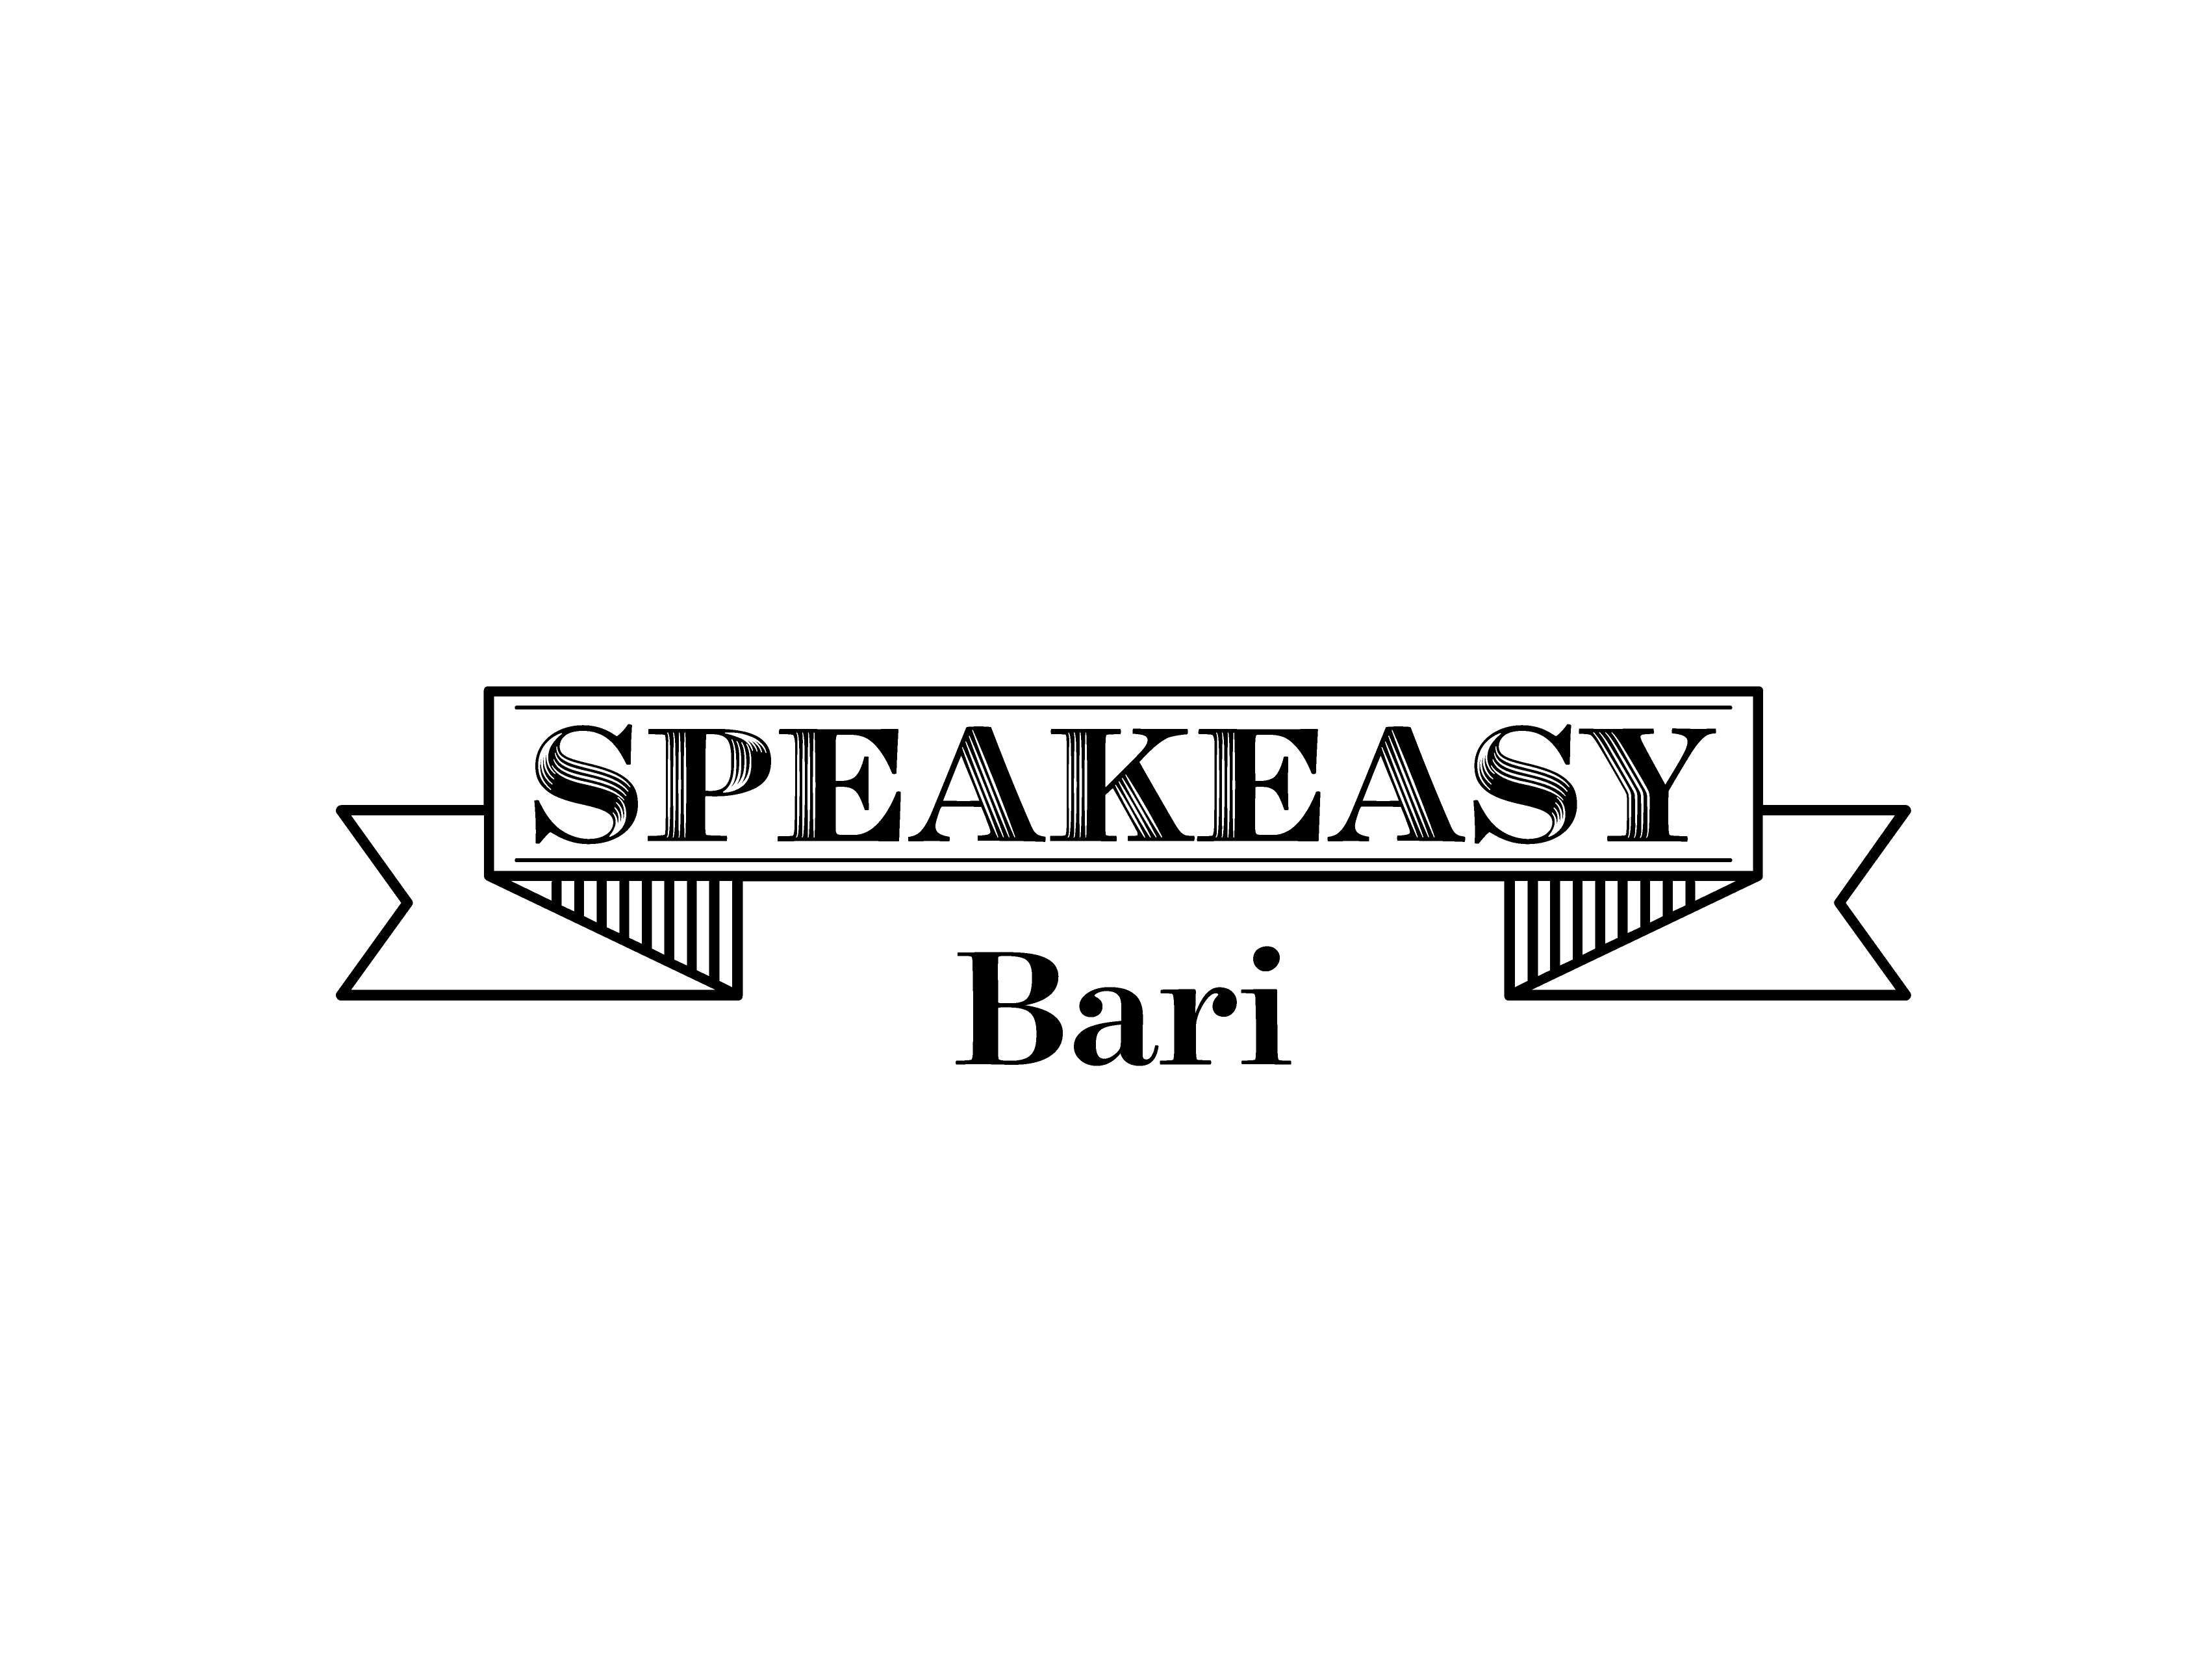 logo speakeasy bari